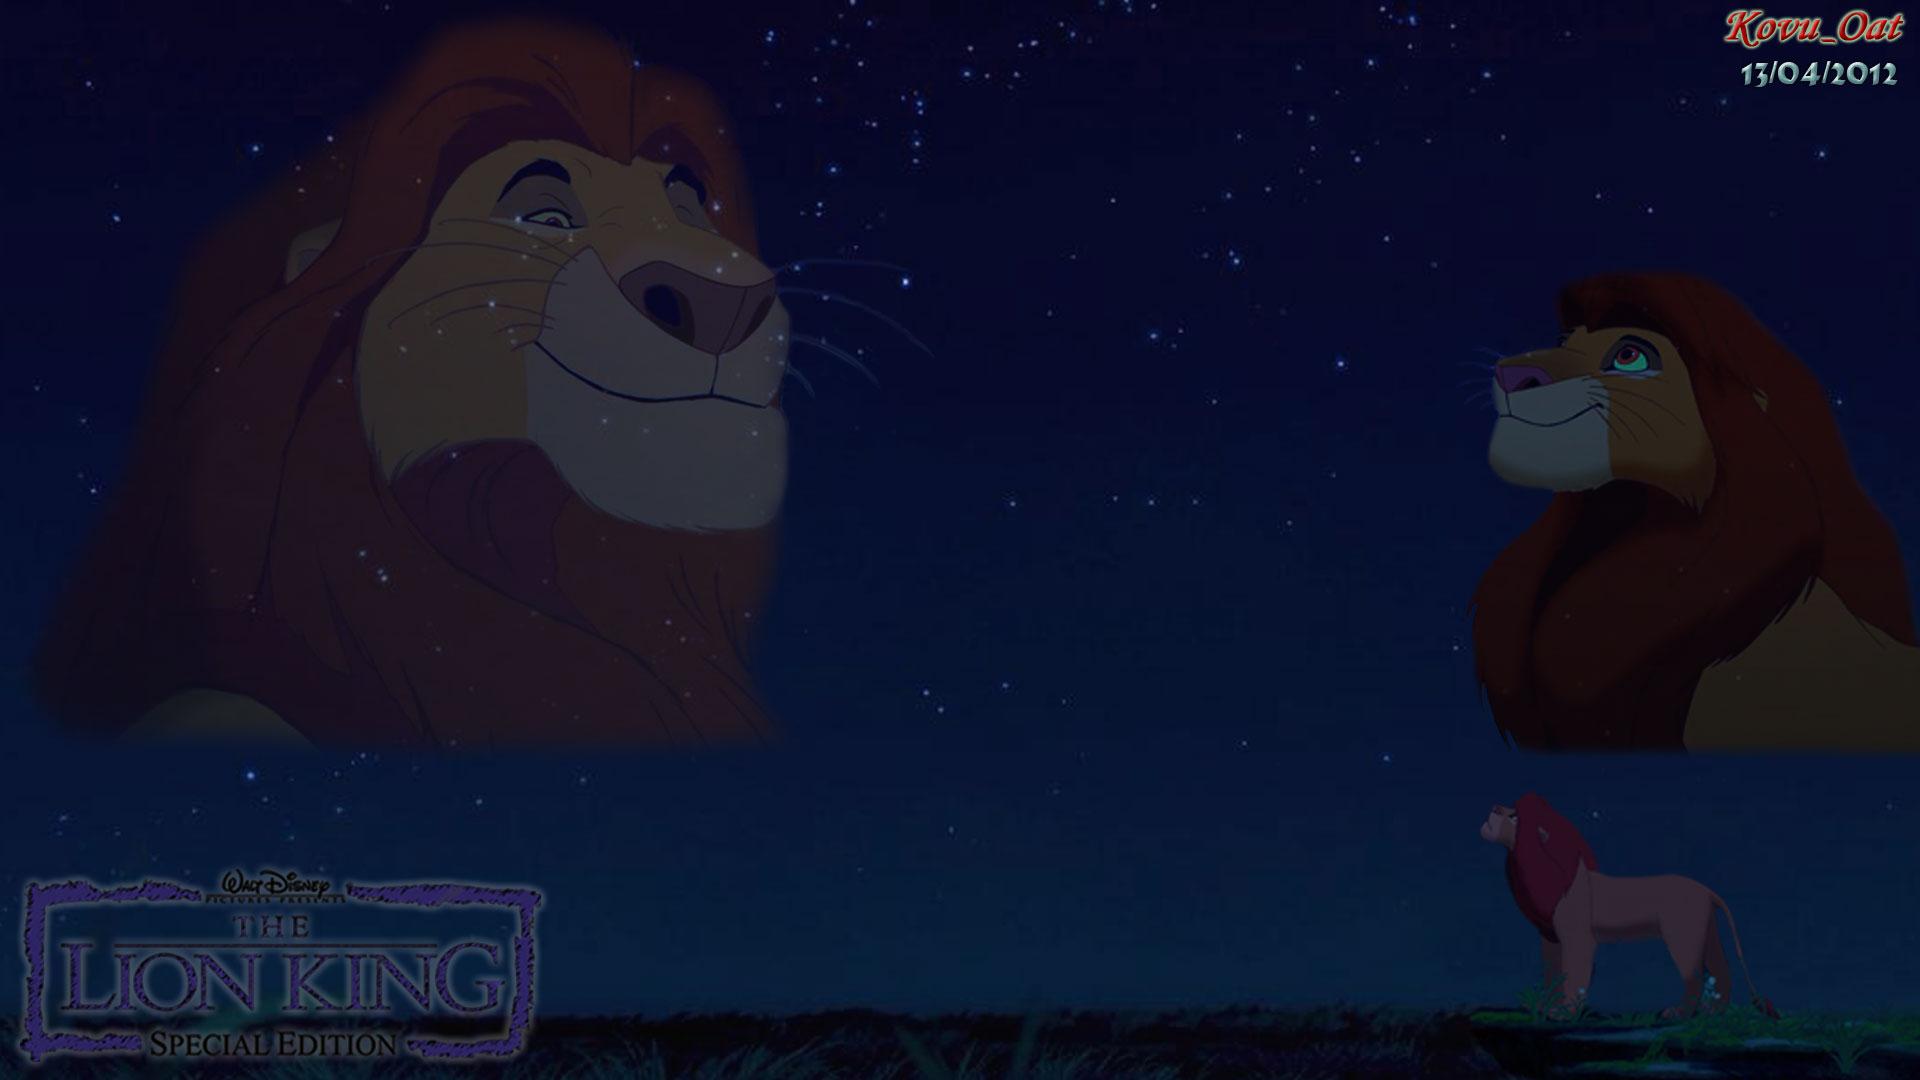 Simba love night sky Wallpaper HD HD wallpaper and background photos 1920x1080